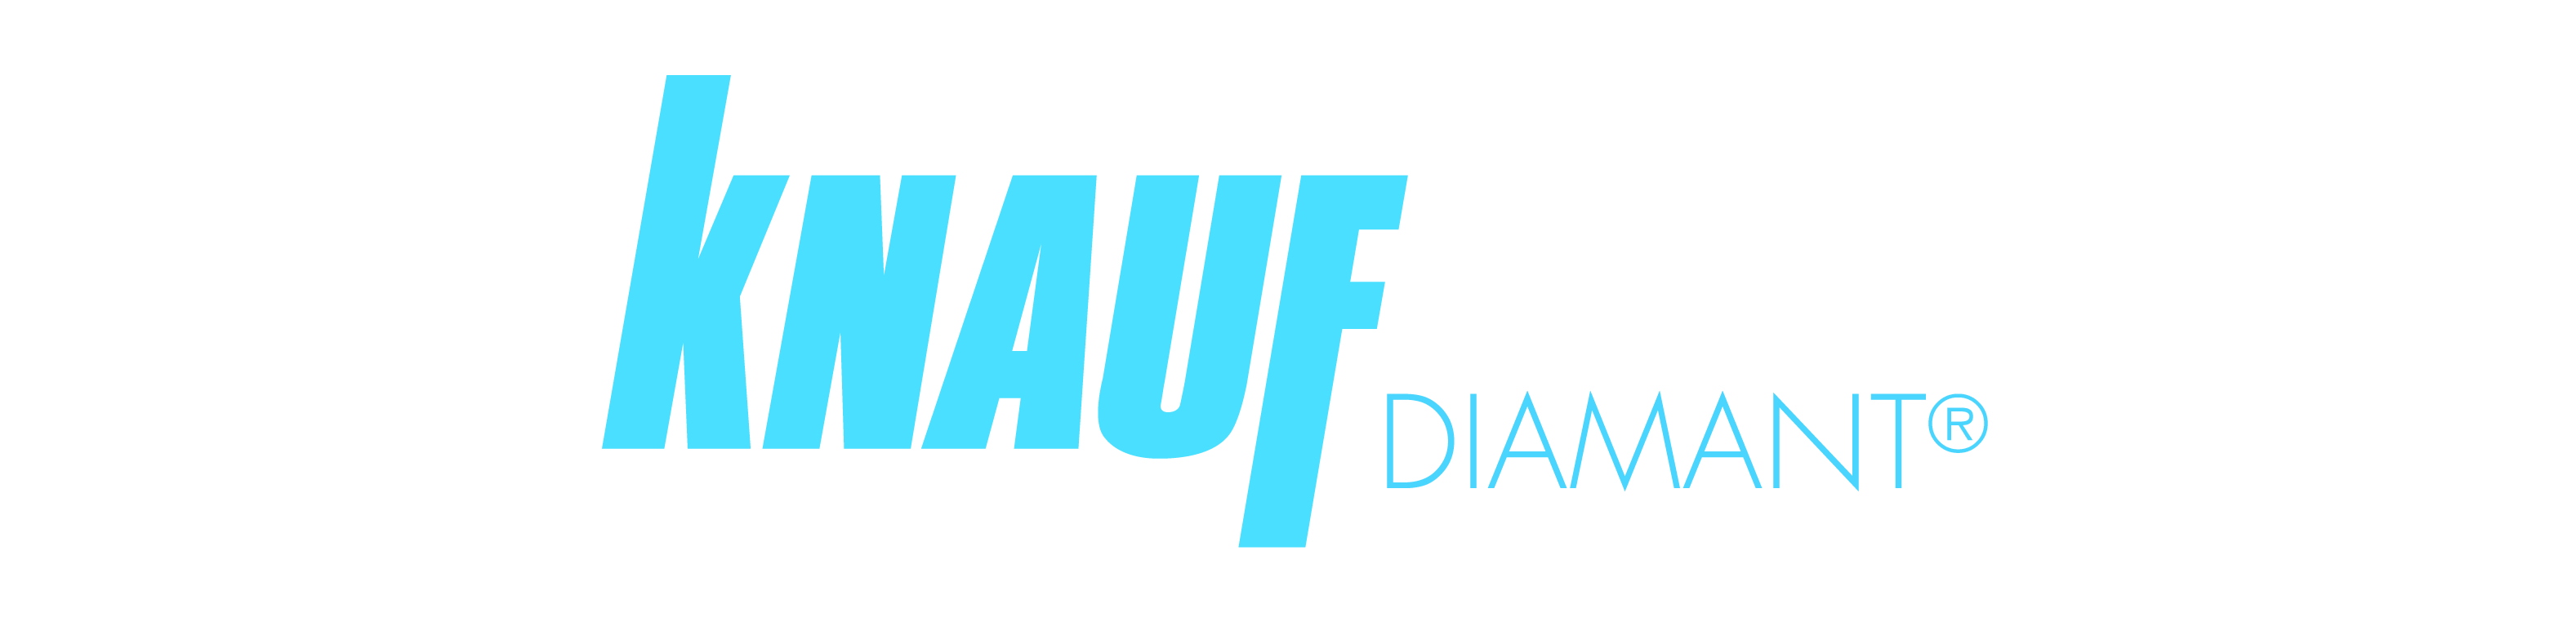 logotipo knauf diamant